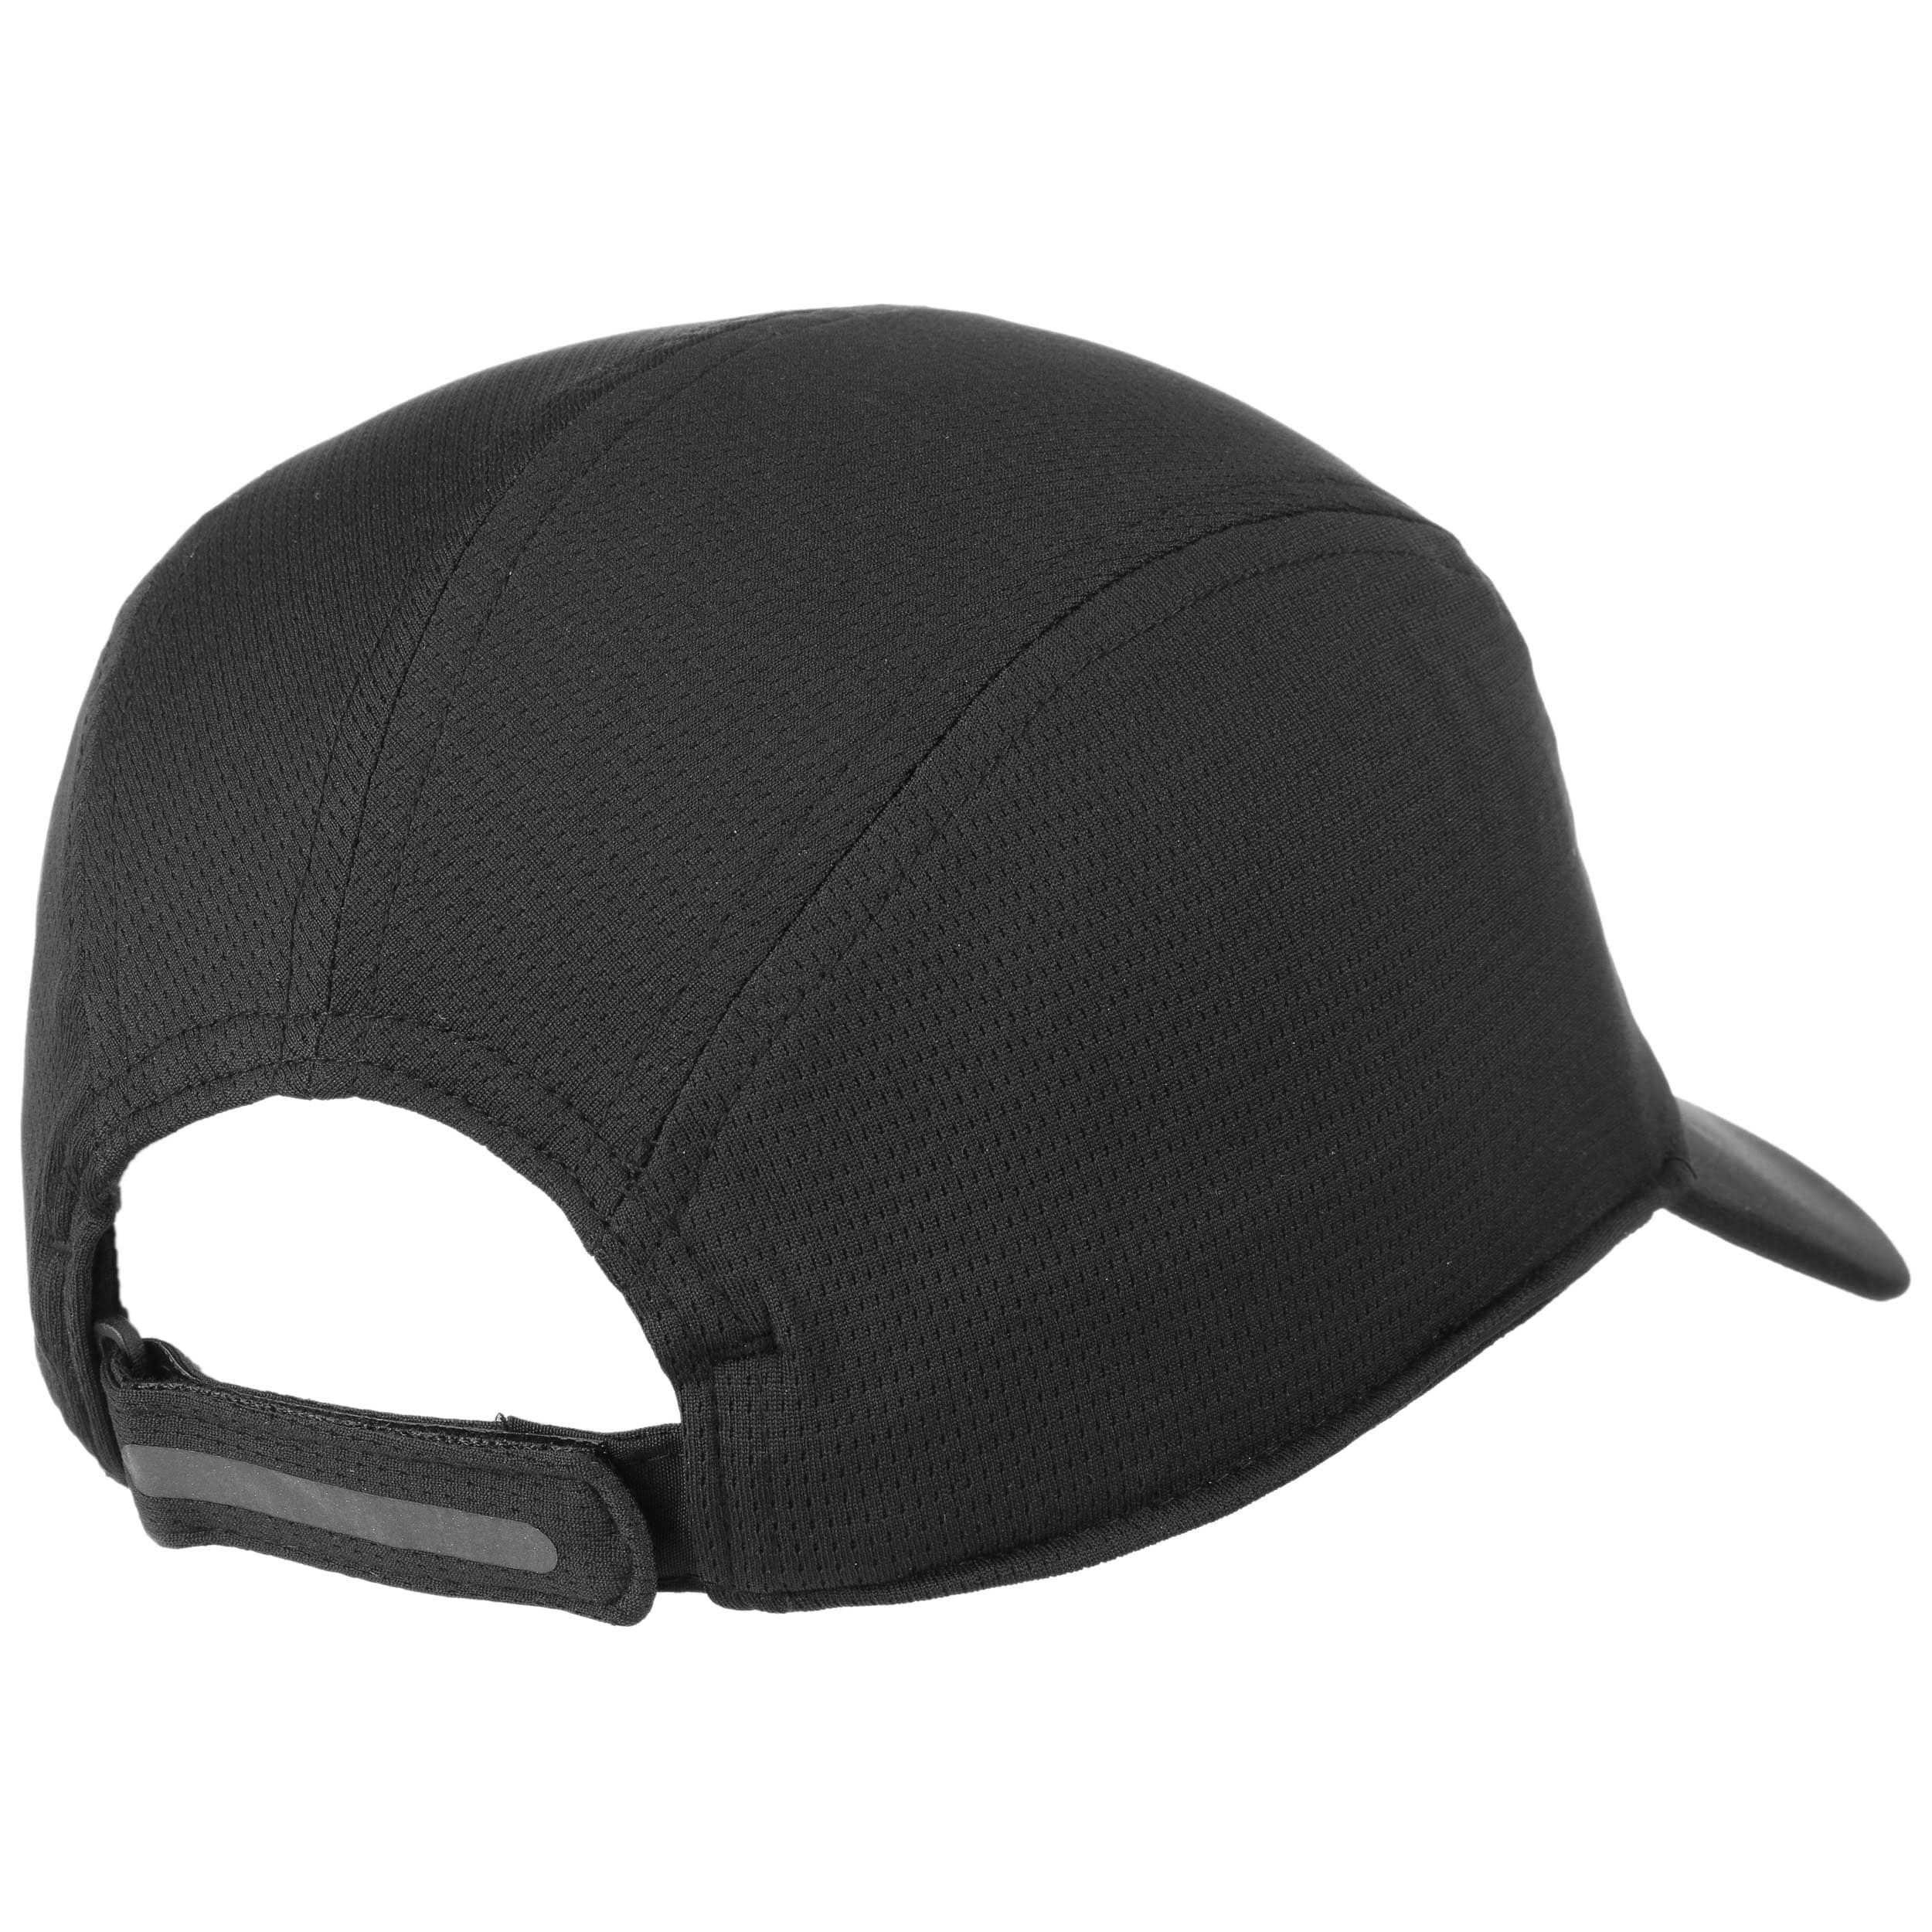 Gorra Climacool Running by adidas - Gorras - sombreroshop.es 2313e22036d